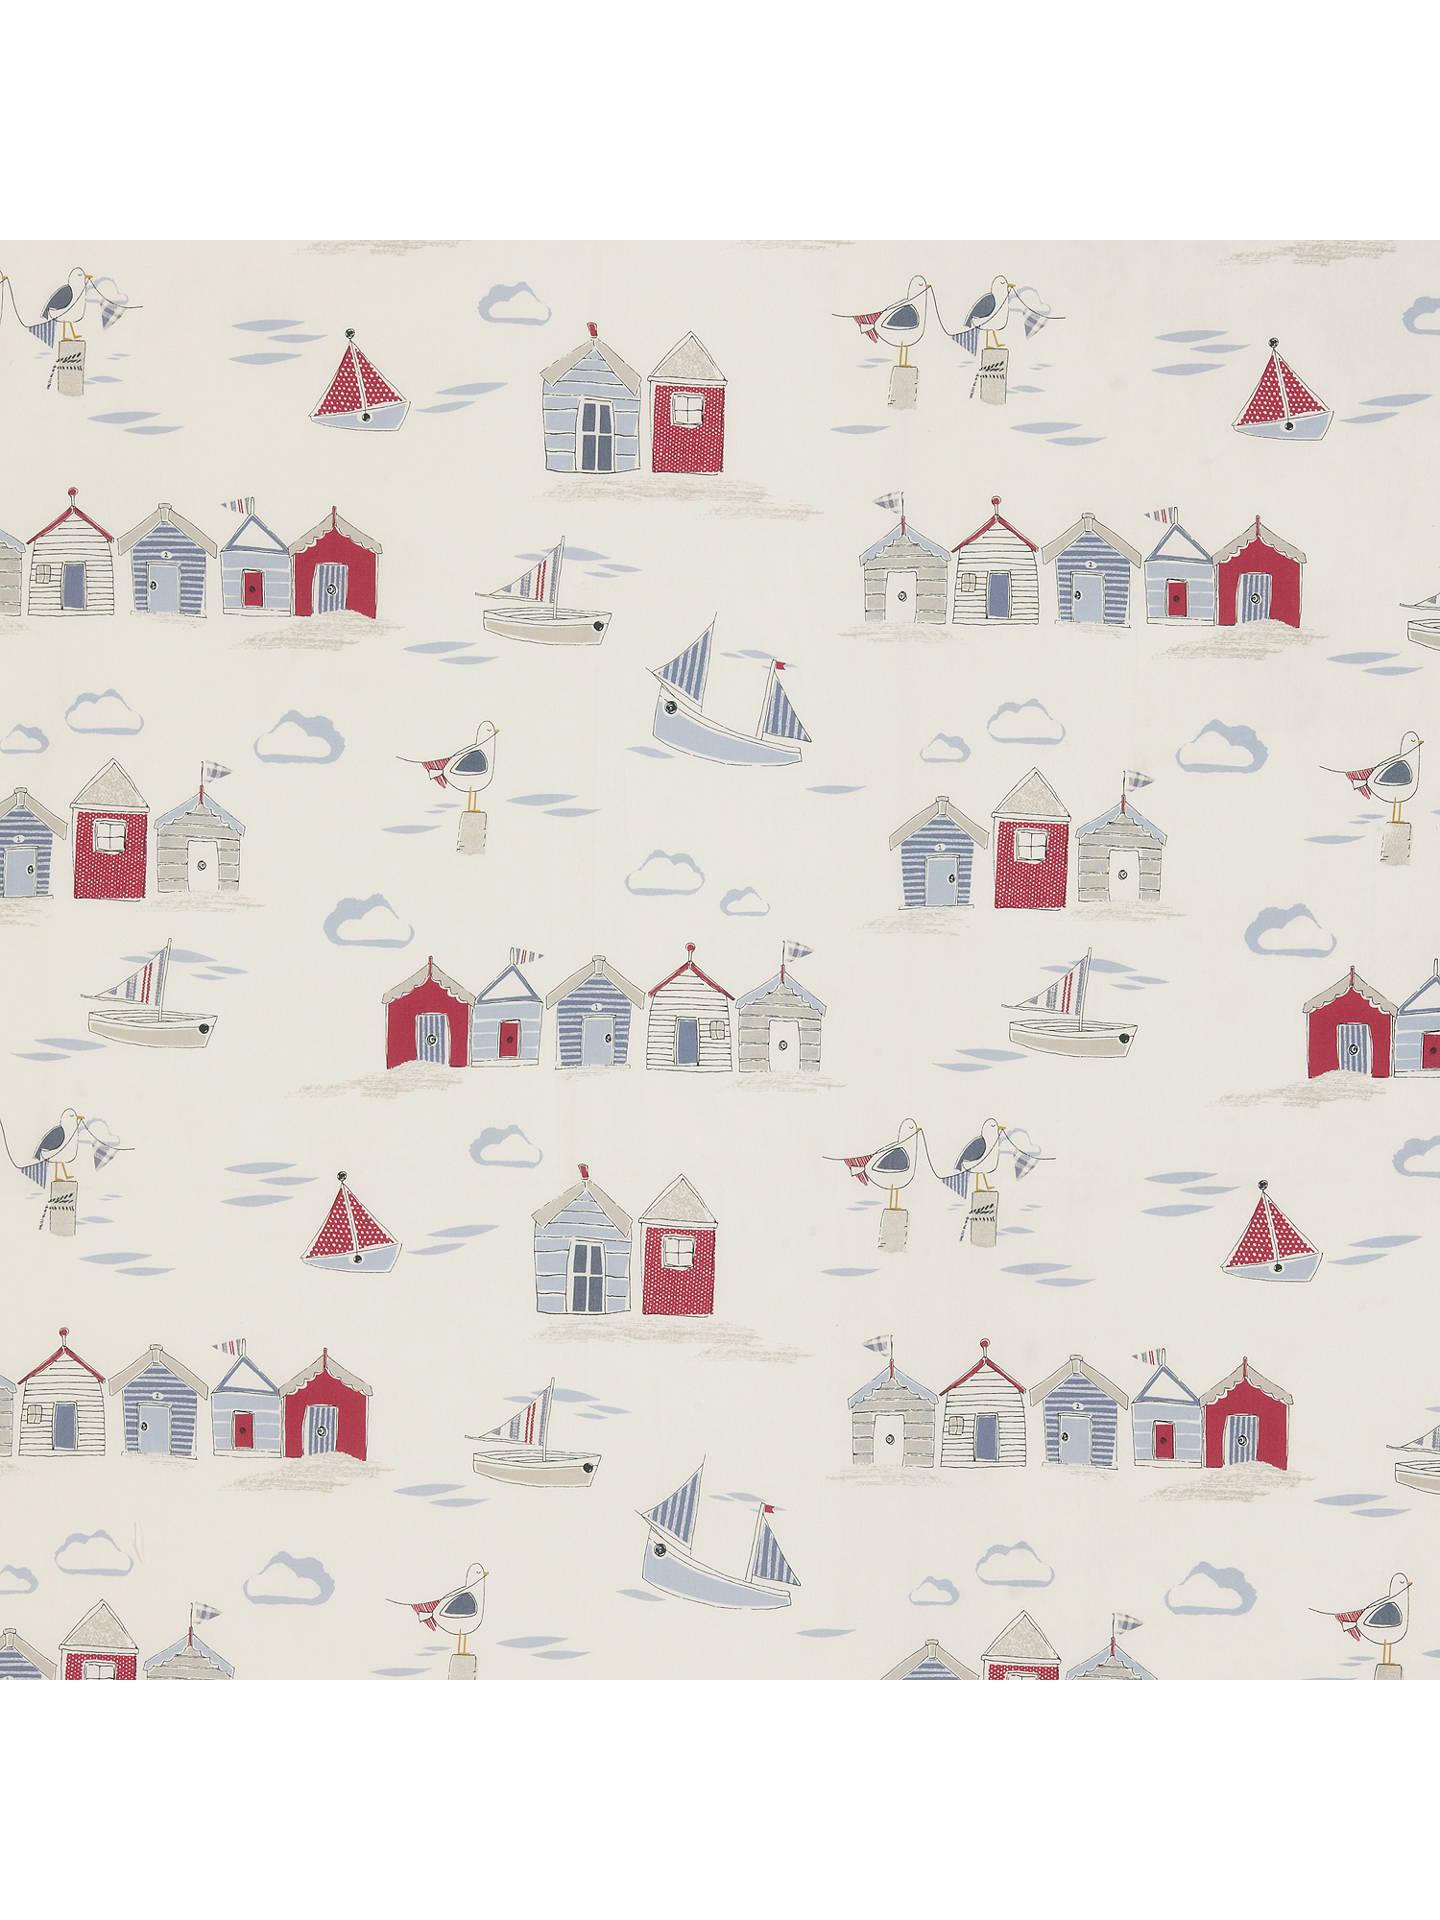 6956d7ee4c6 Buy John Lewis Beside The Seaside Furnishing Fabric